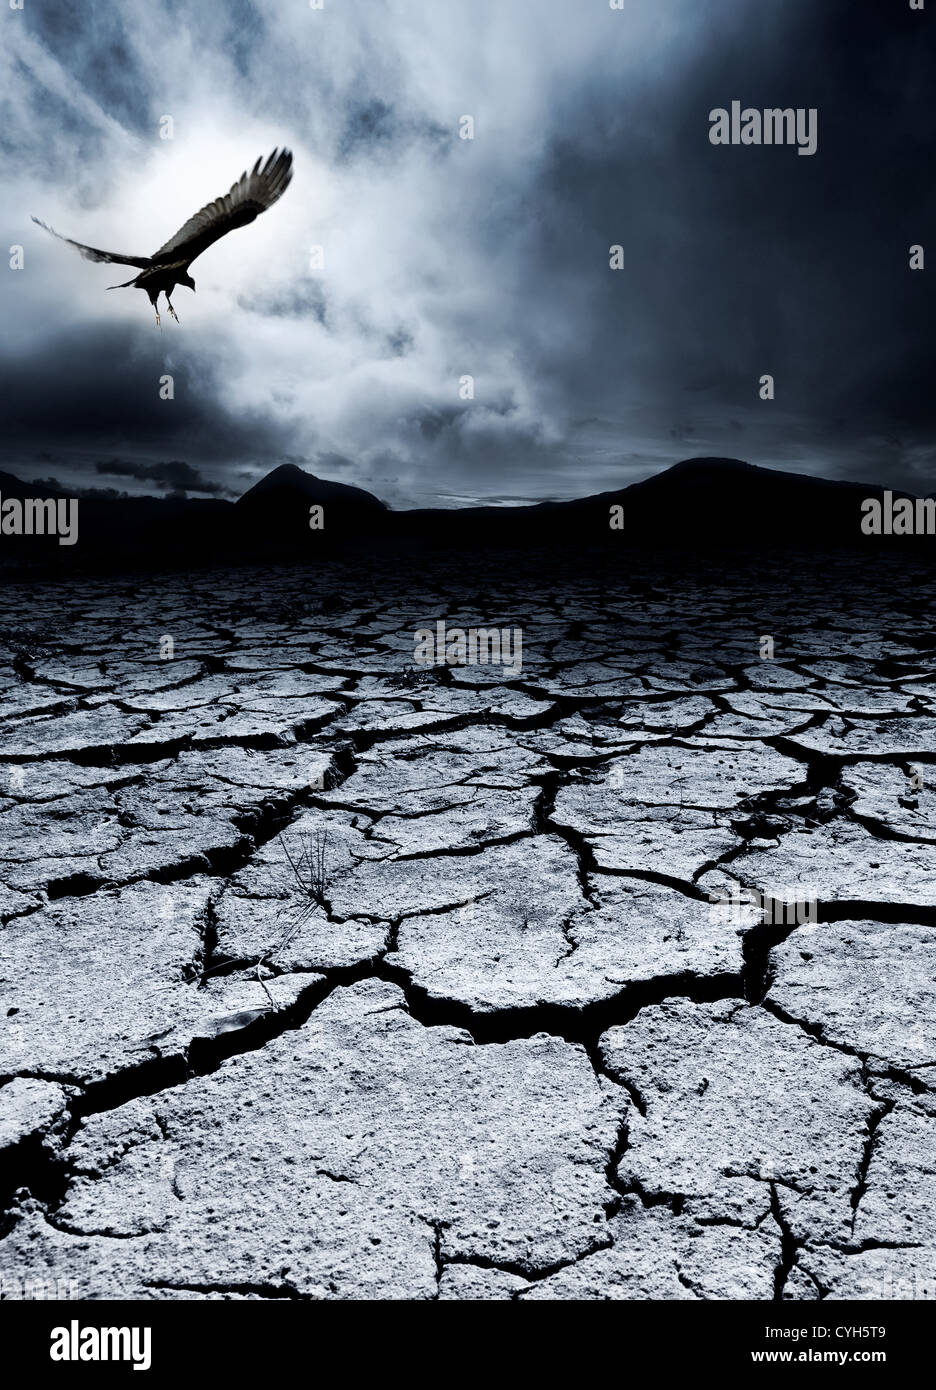 Un pájaro vuela sobre un paisaje desolado Imagen De Stock